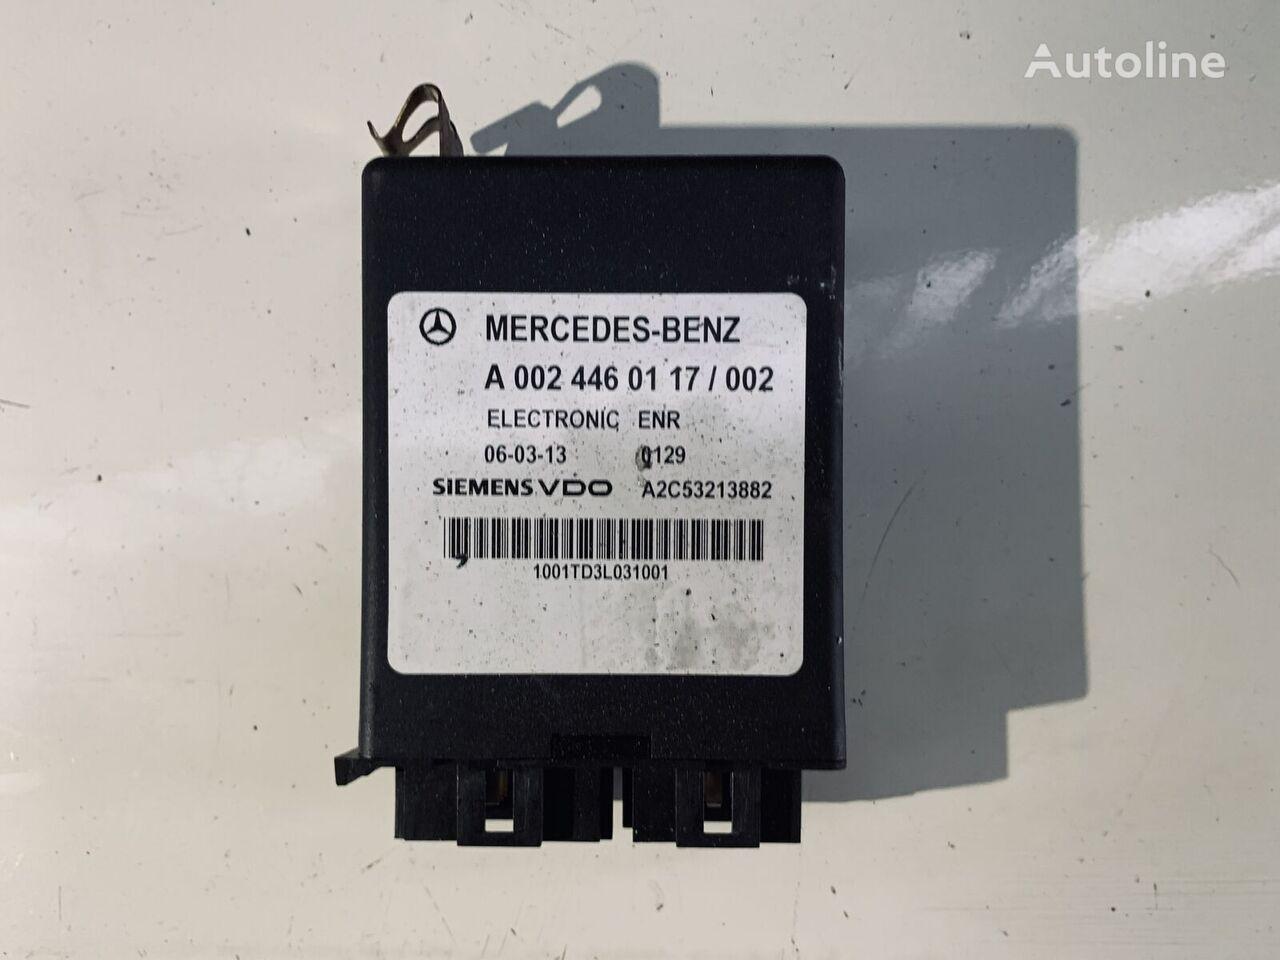 блок управления MERCEDES-BENZ 1824 (Siemens VDO) для грузовика MERCEDES-BENZ